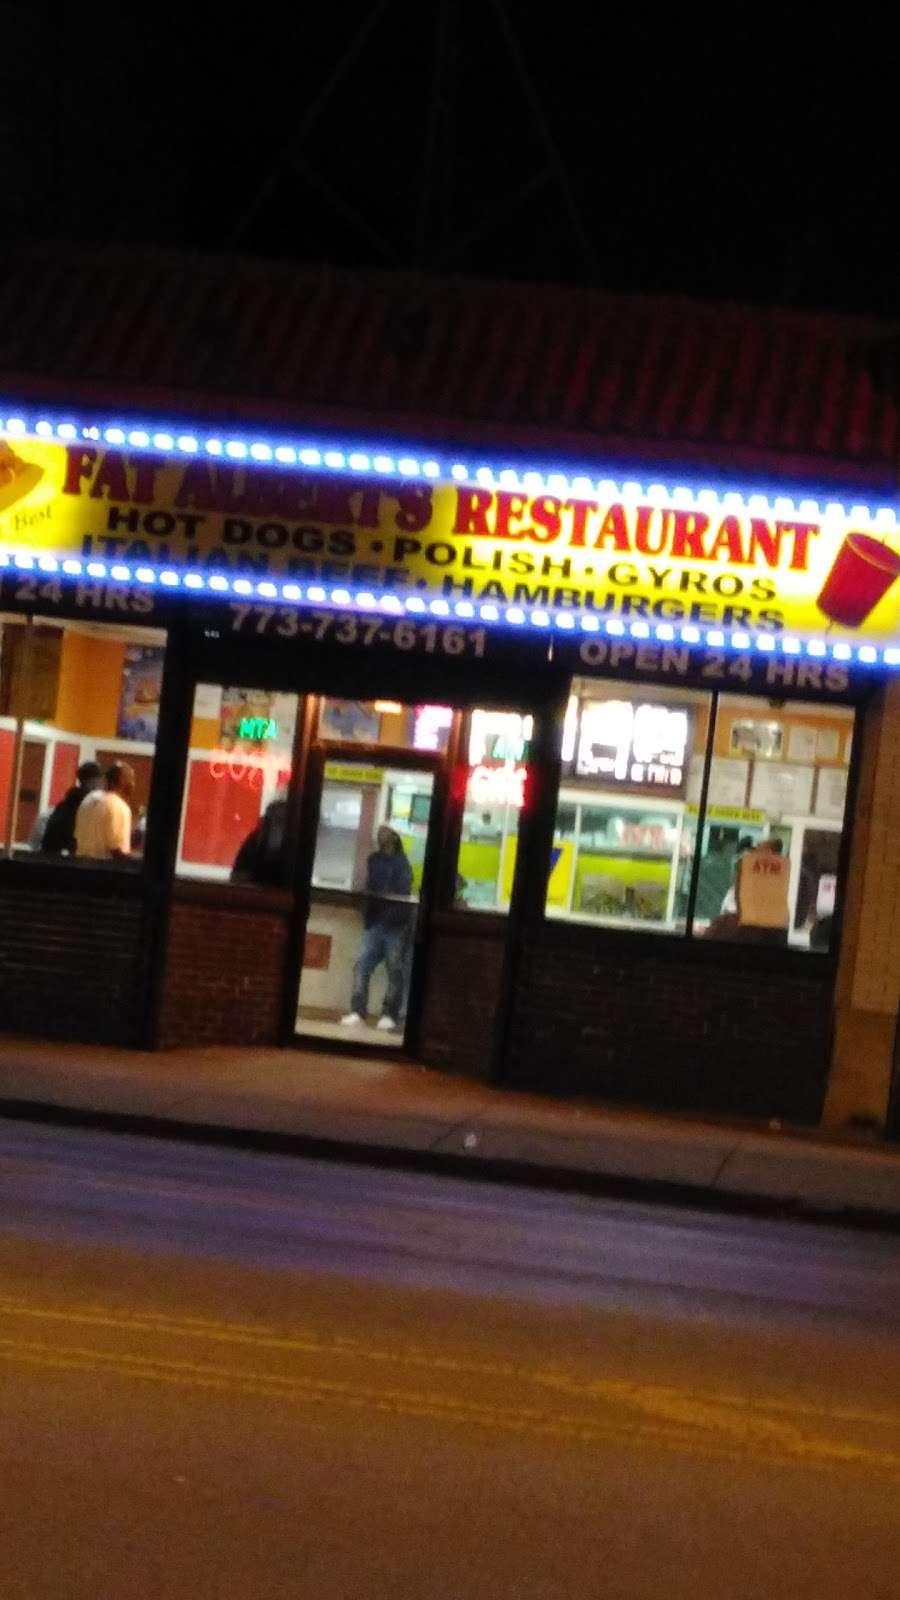 Fat Albert - restaurant    Photo 10 of 10   Address: 6854 S Ashland Ave, Chicago, IL 60636, USA   Phone: (773) 737-6161